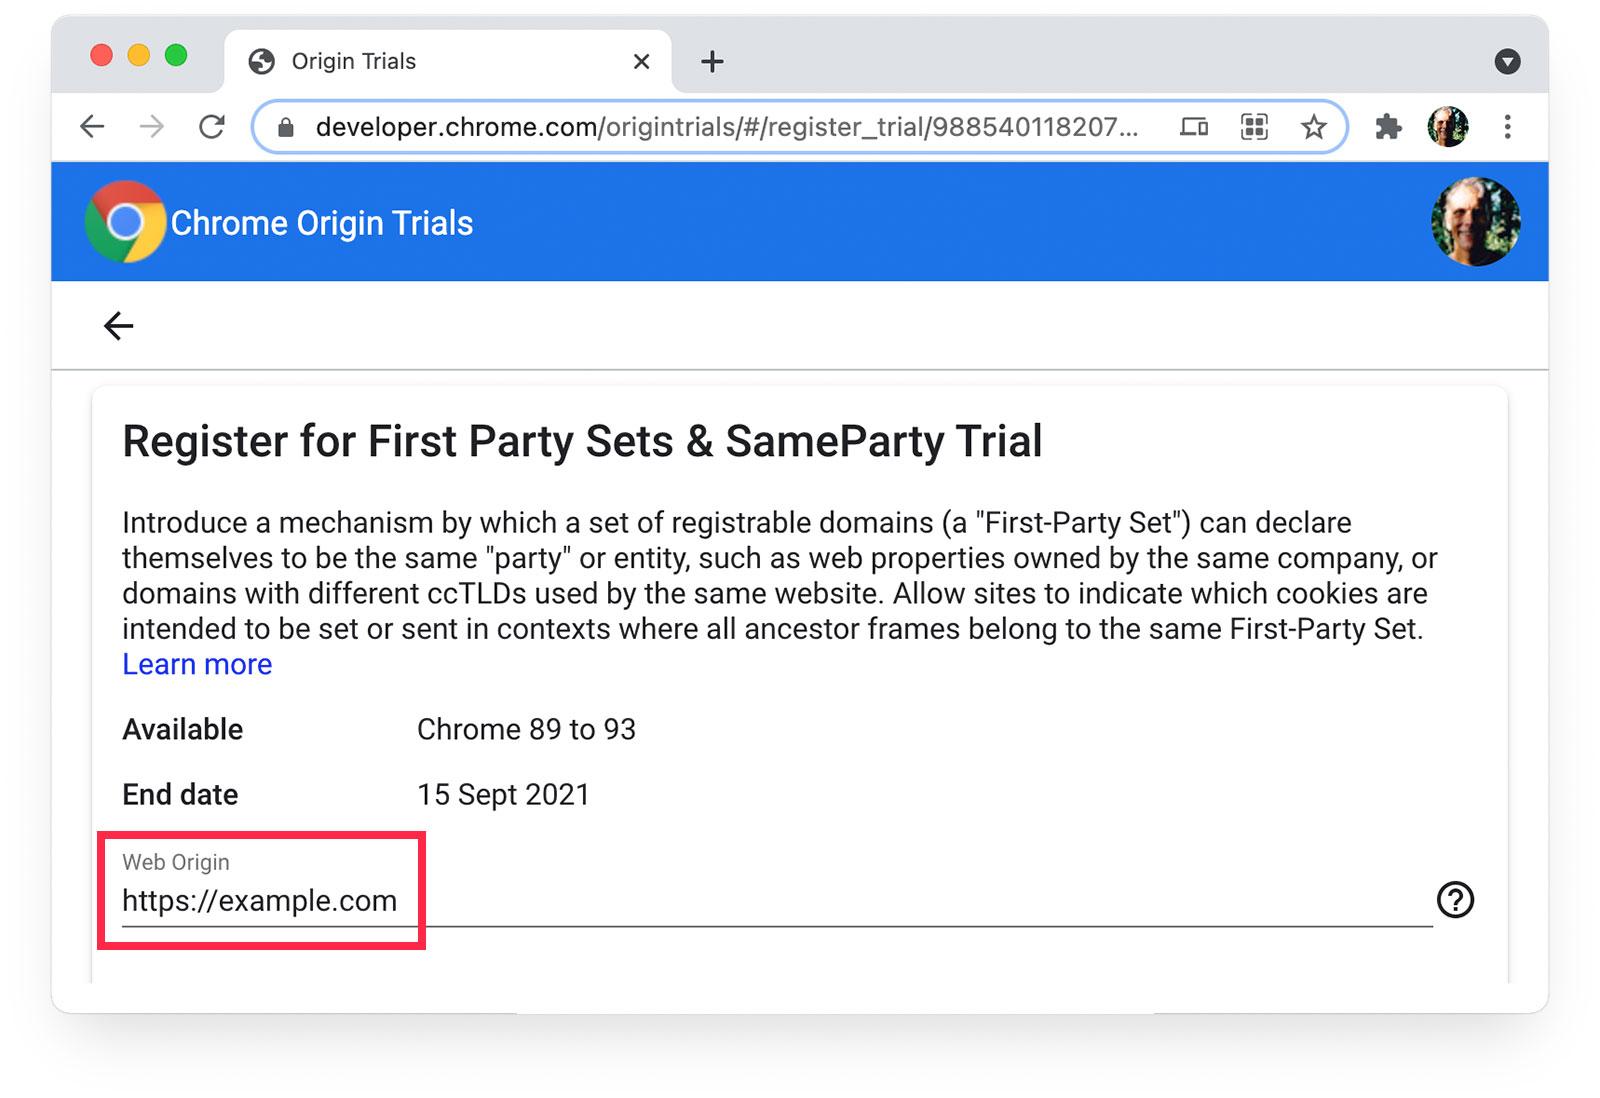 Chrome Origin Trials  page showing https://example.com selected as Web Origin